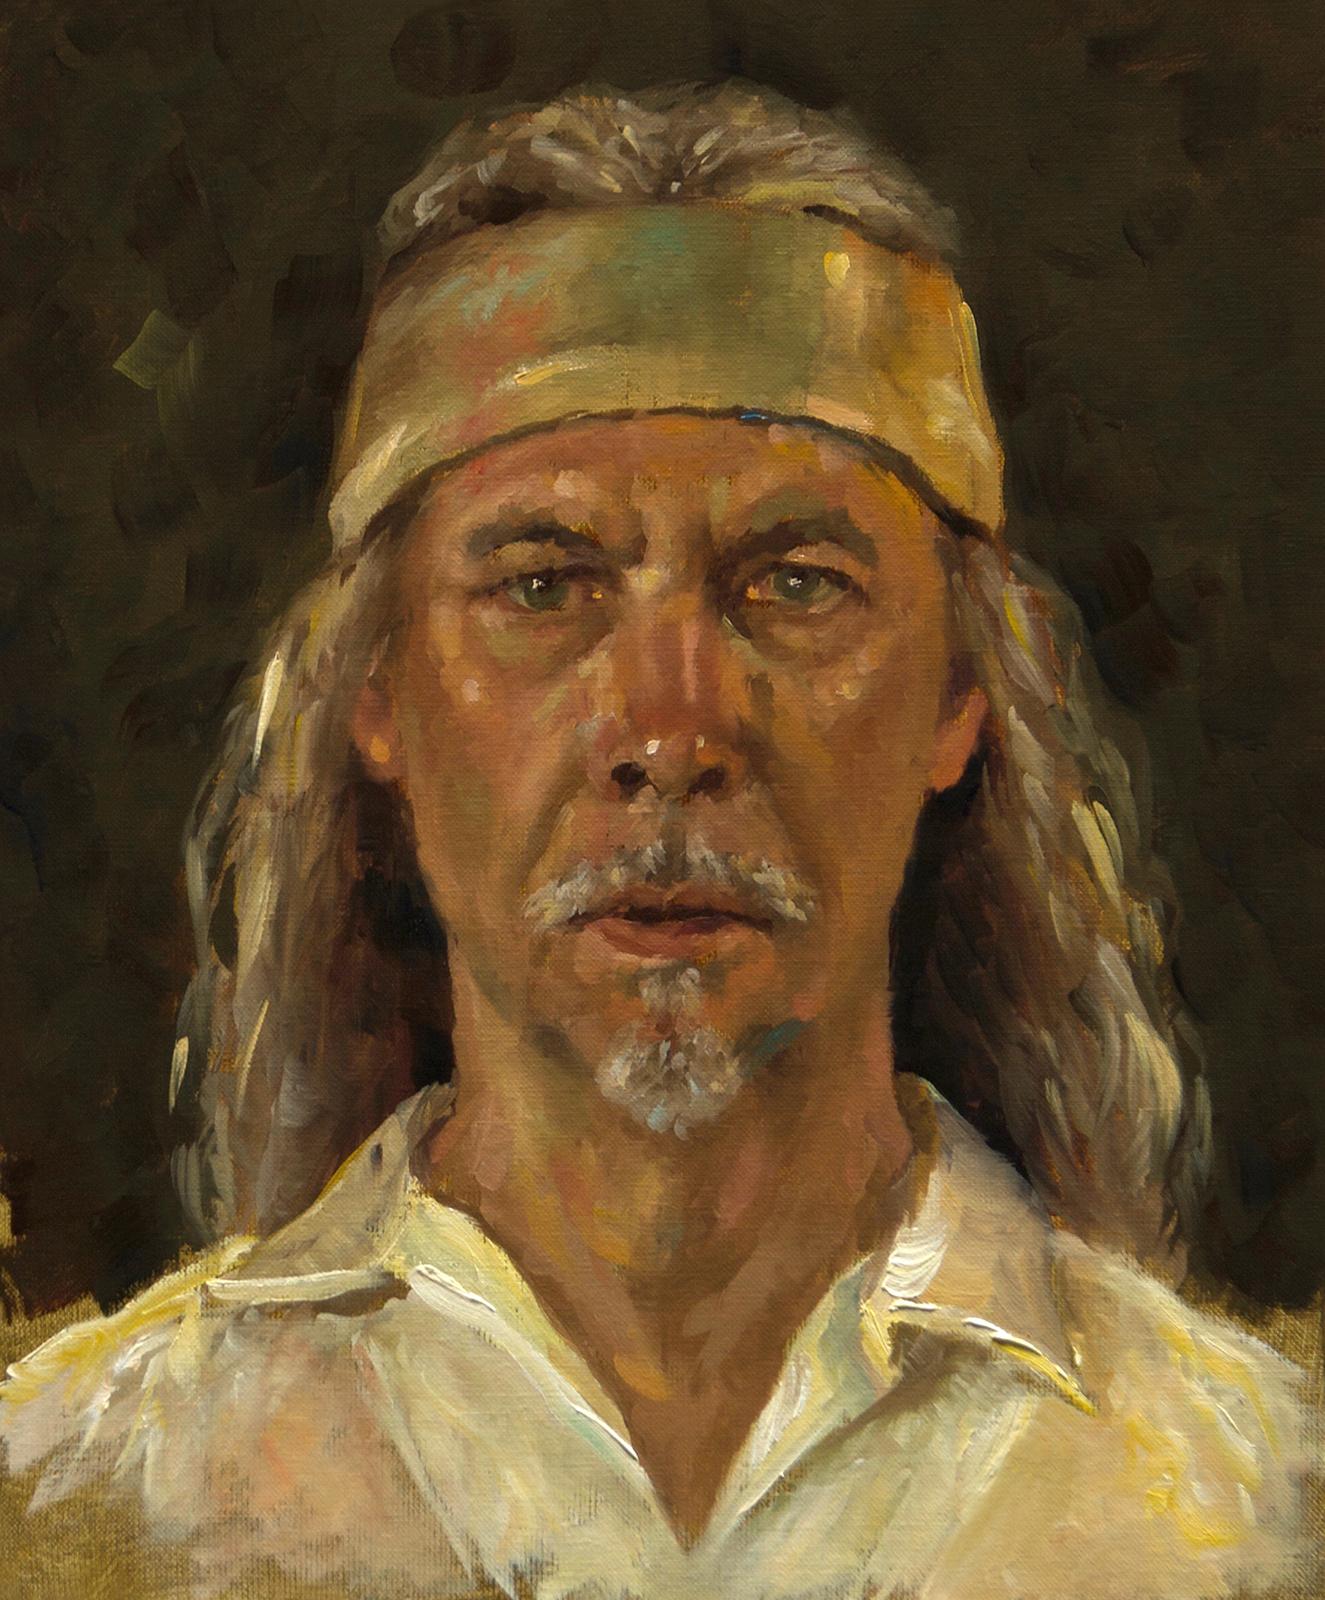 Autoportrait Cyrano de Bergerac